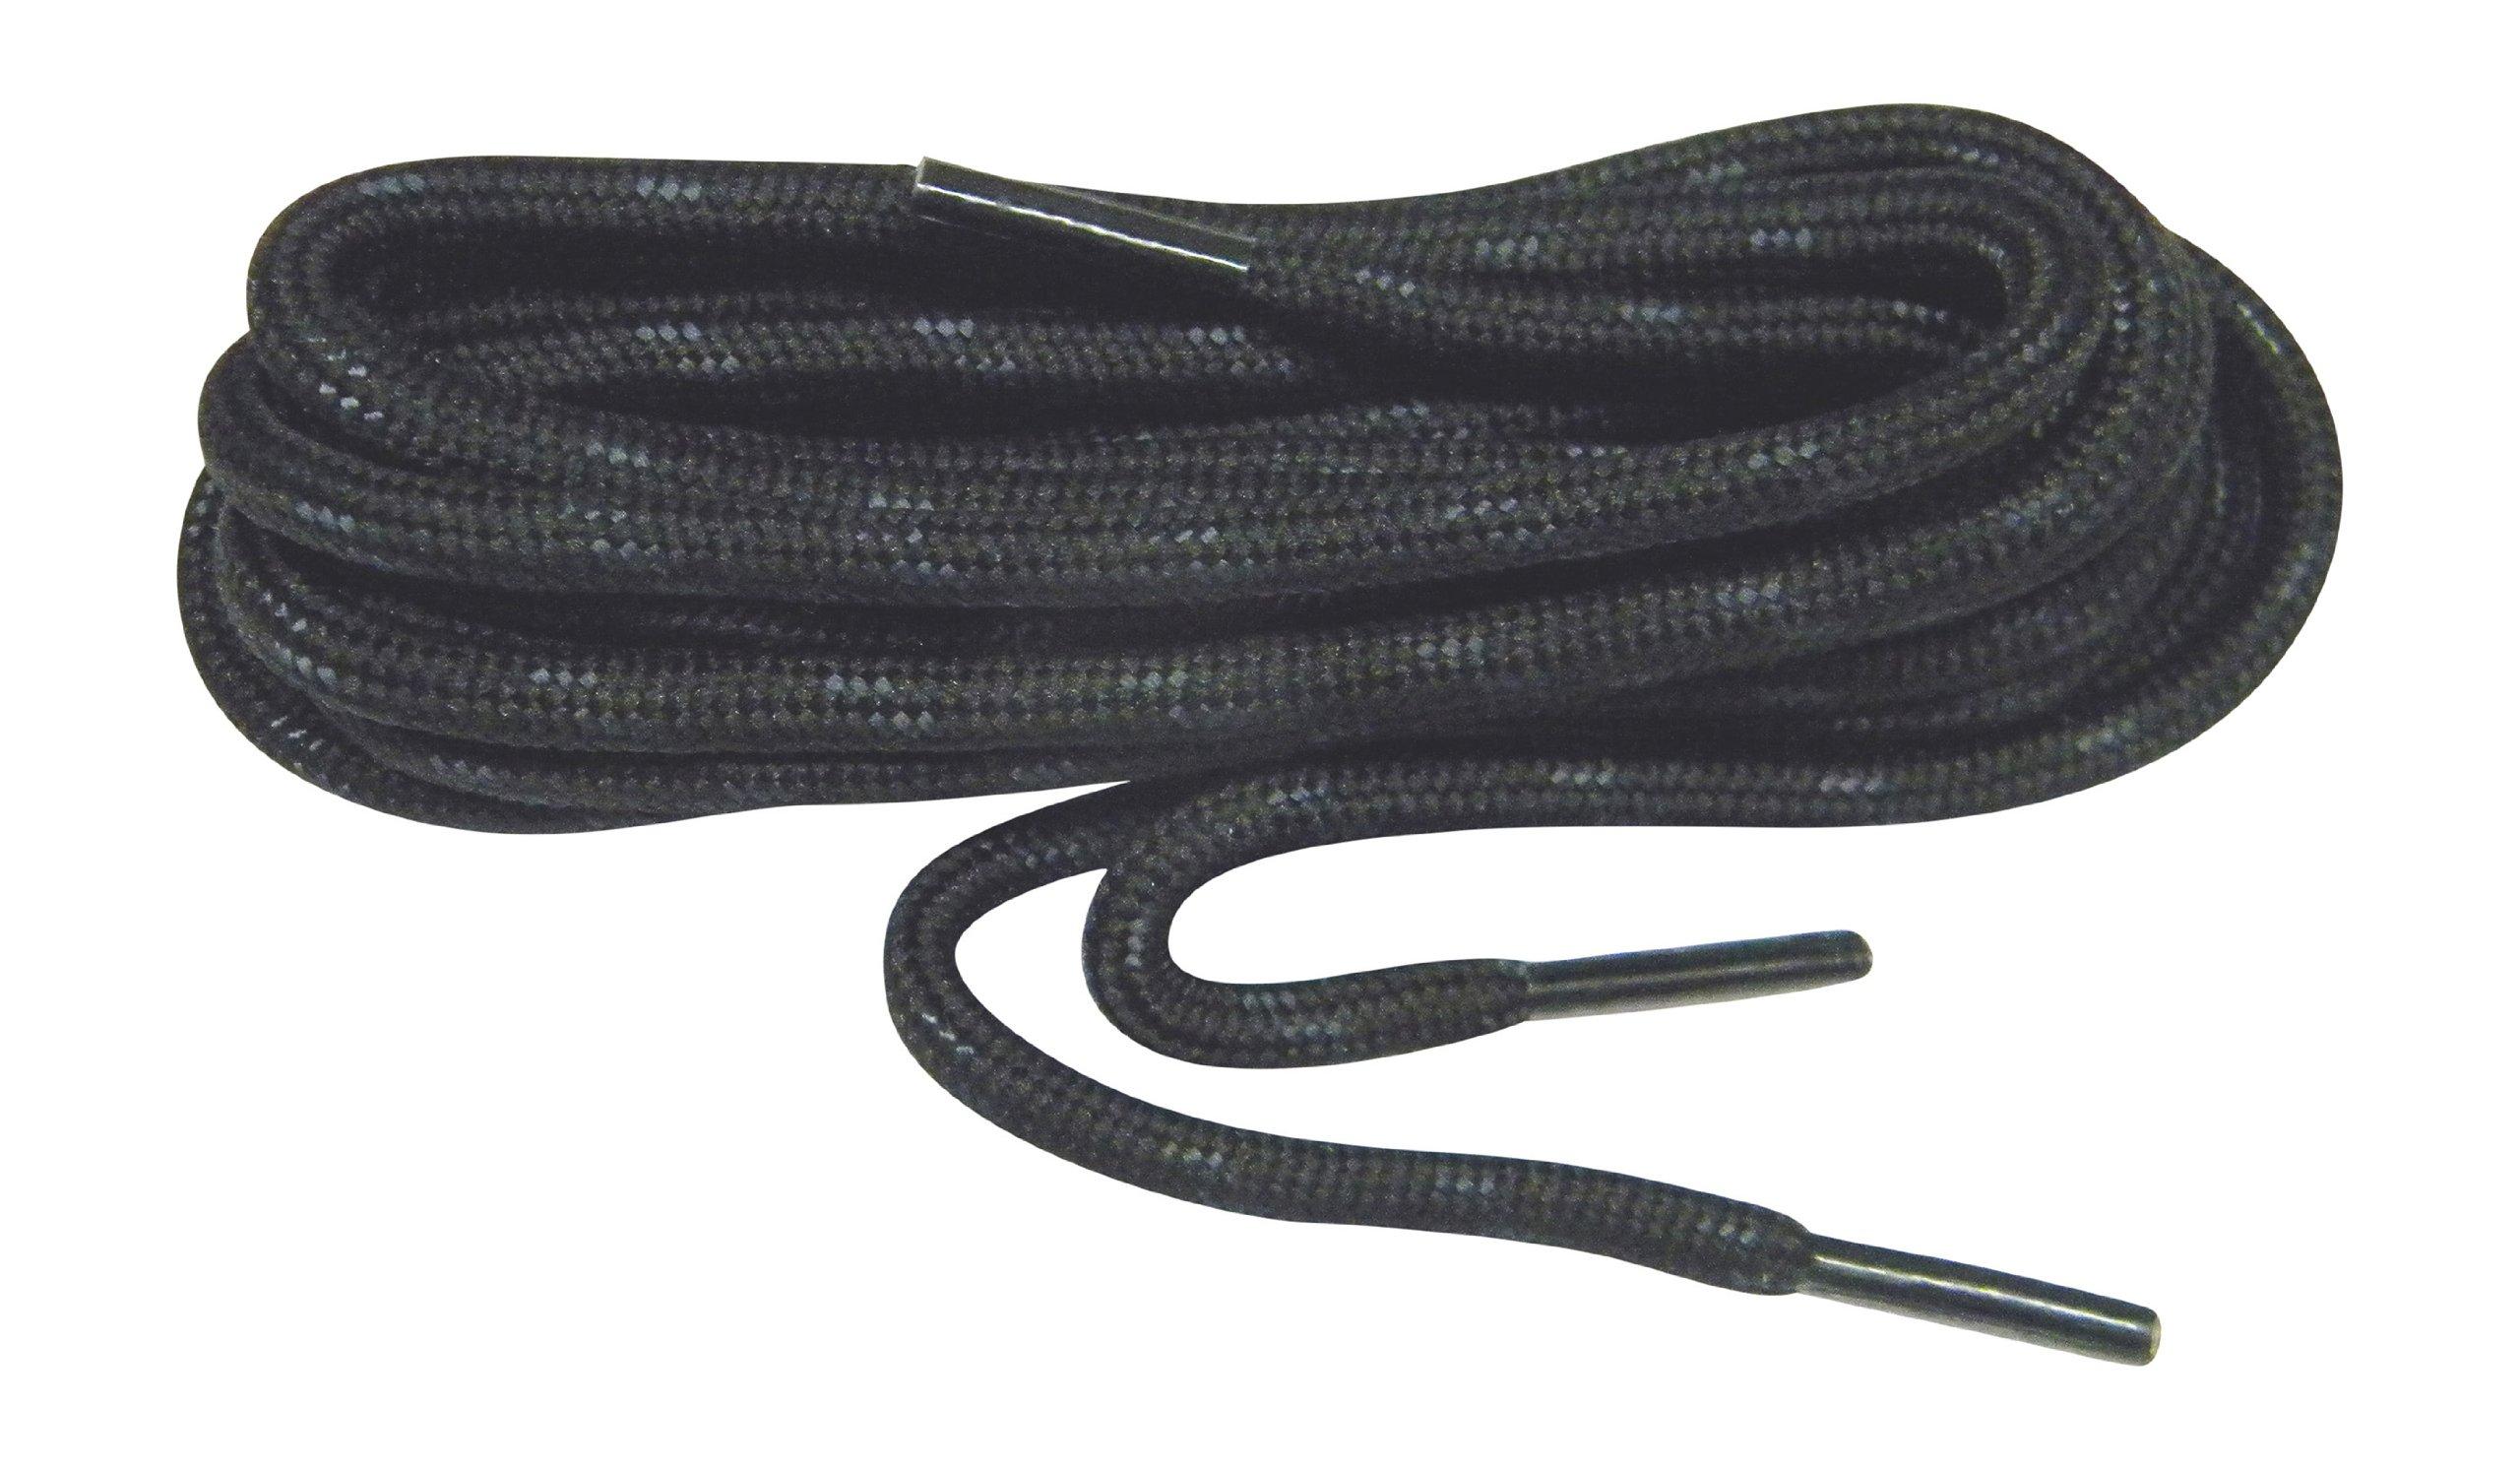 GREATLACES 72 Inch Black w/Black Kevlar proTOUGH(TM) Reinforced Heavy Duty Boot Laces Shoelaces (2 Pair Pack)